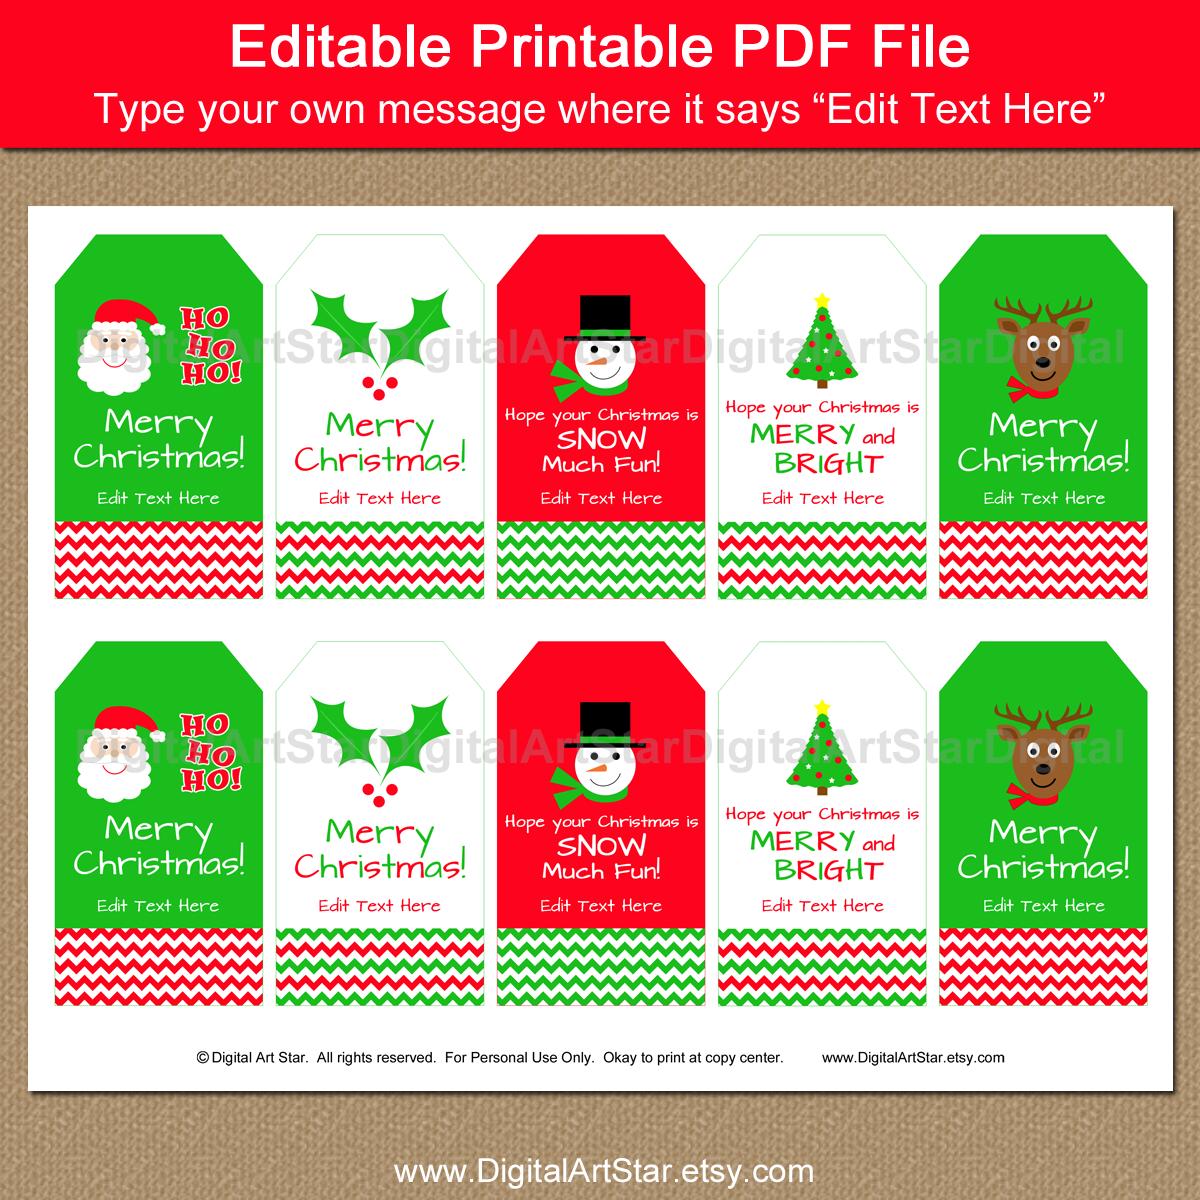 digital art star printable party decor printable christmas chevron gift tags with editable text. Black Bedroom Furniture Sets. Home Design Ideas